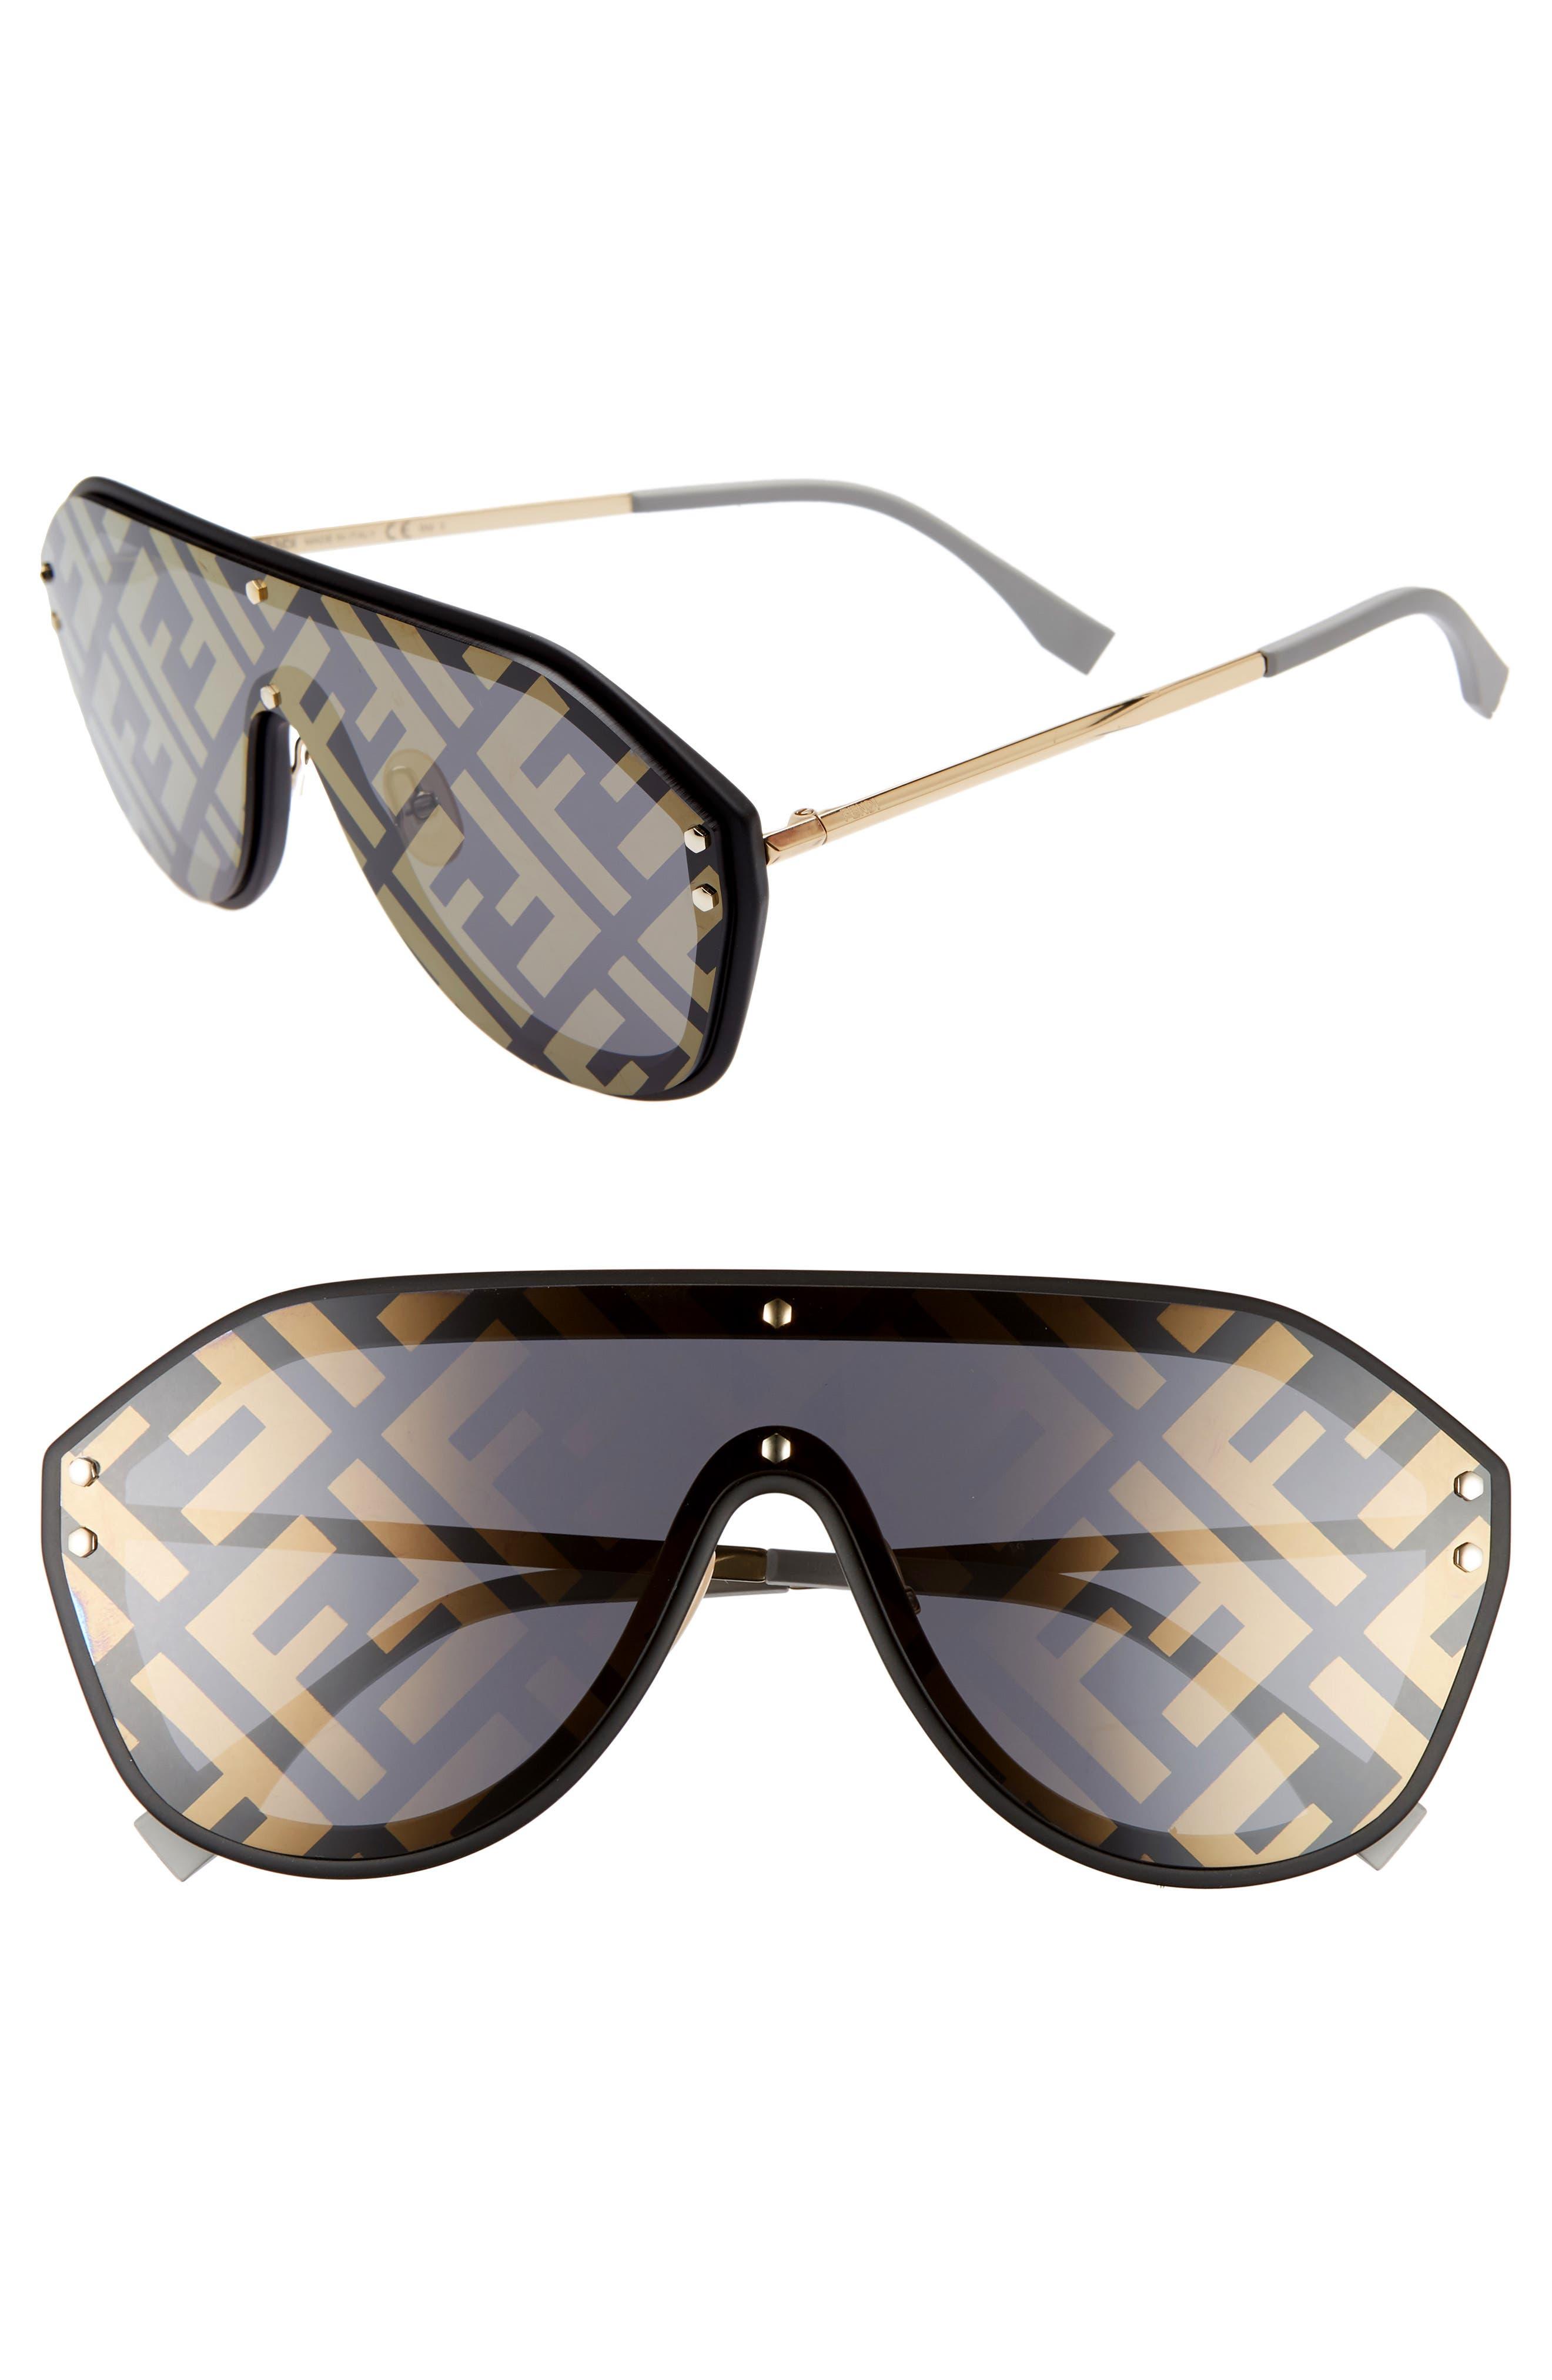 9b0a18bcd9a9 Women's Designer Sunglasses   Nordstrom